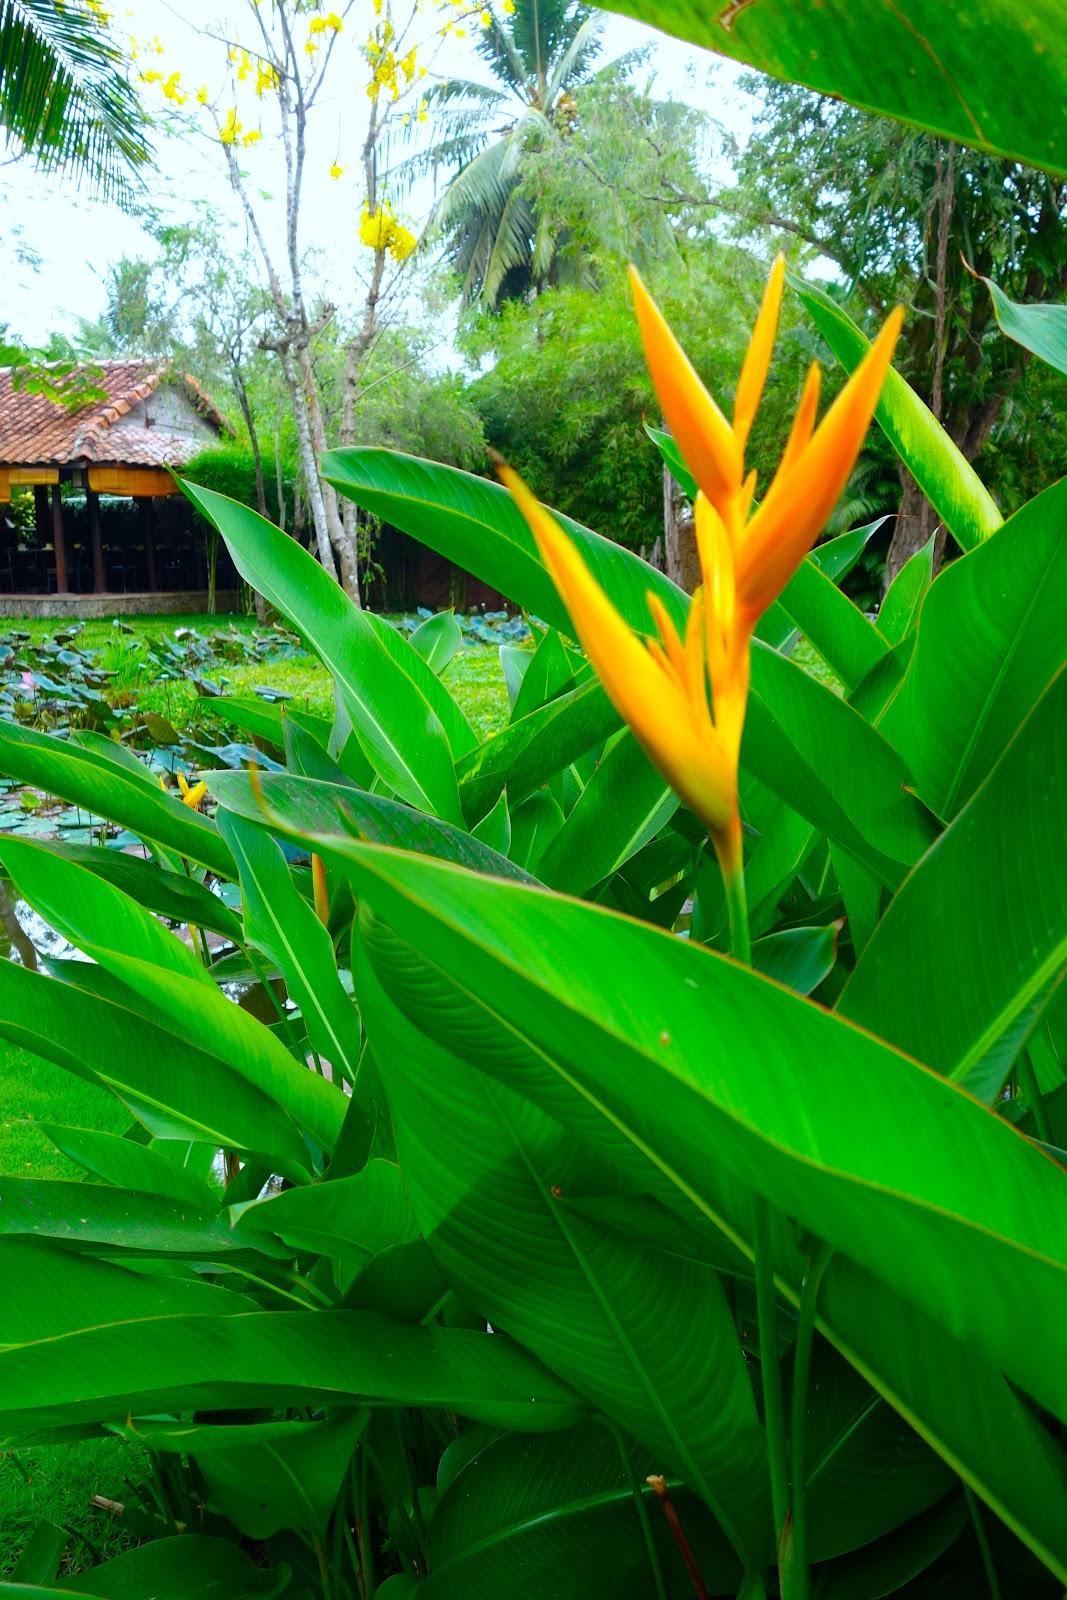 bird of paradise plants Vietnam 2015